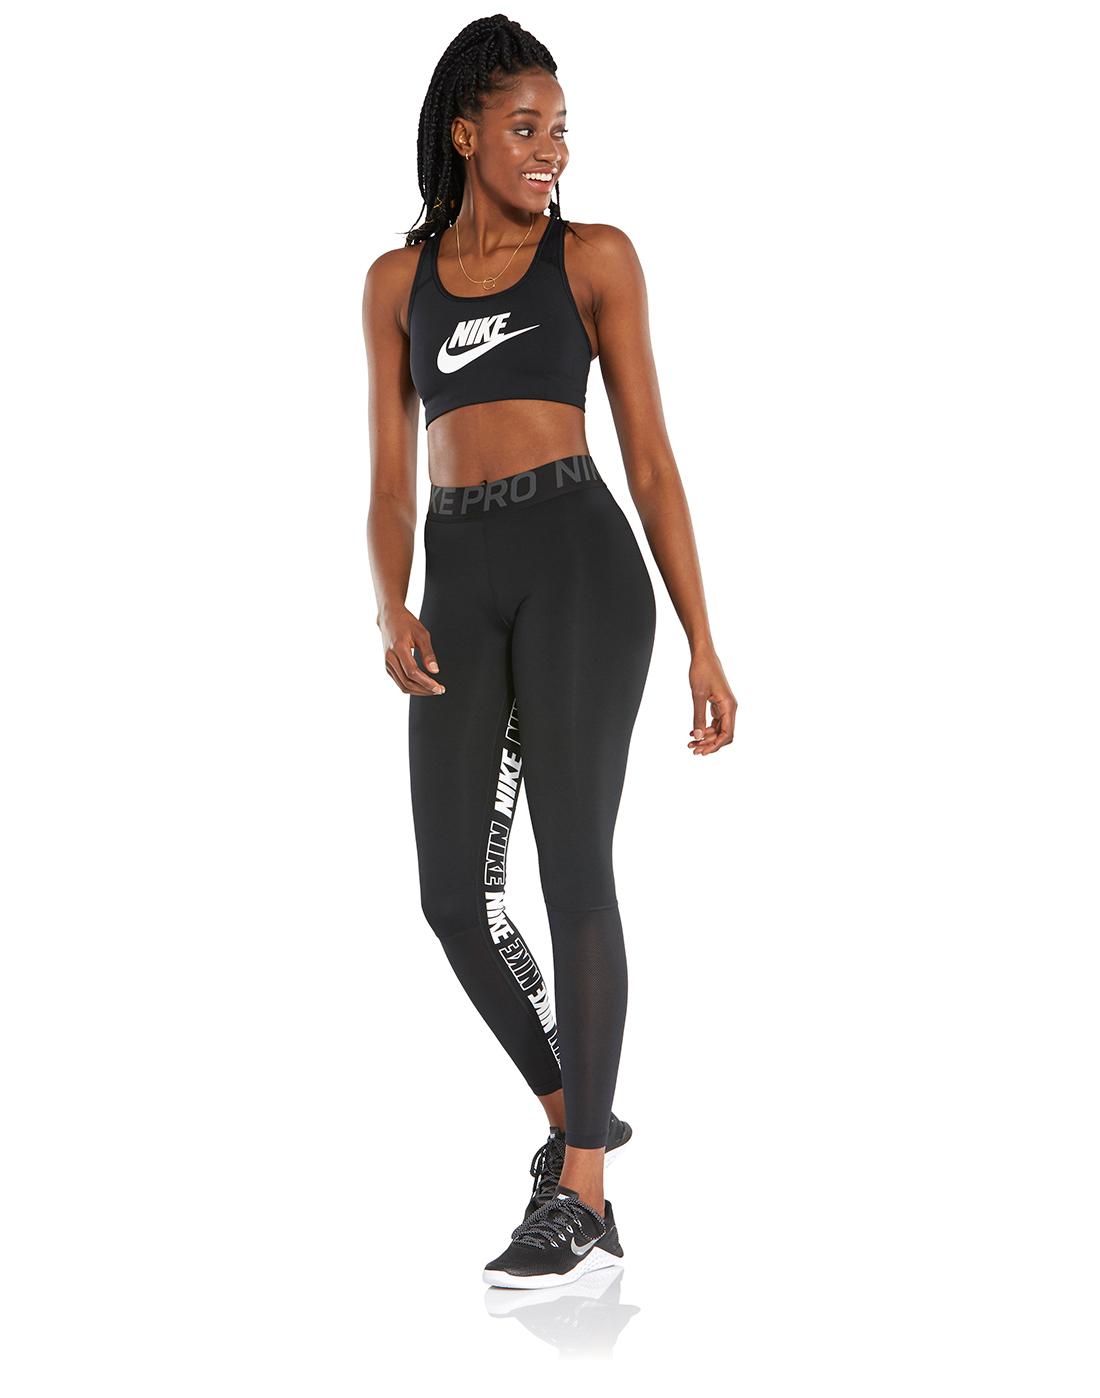 7f03e12cabc574 Women's Black Nike Gym Distort Tights | Life Style Sports